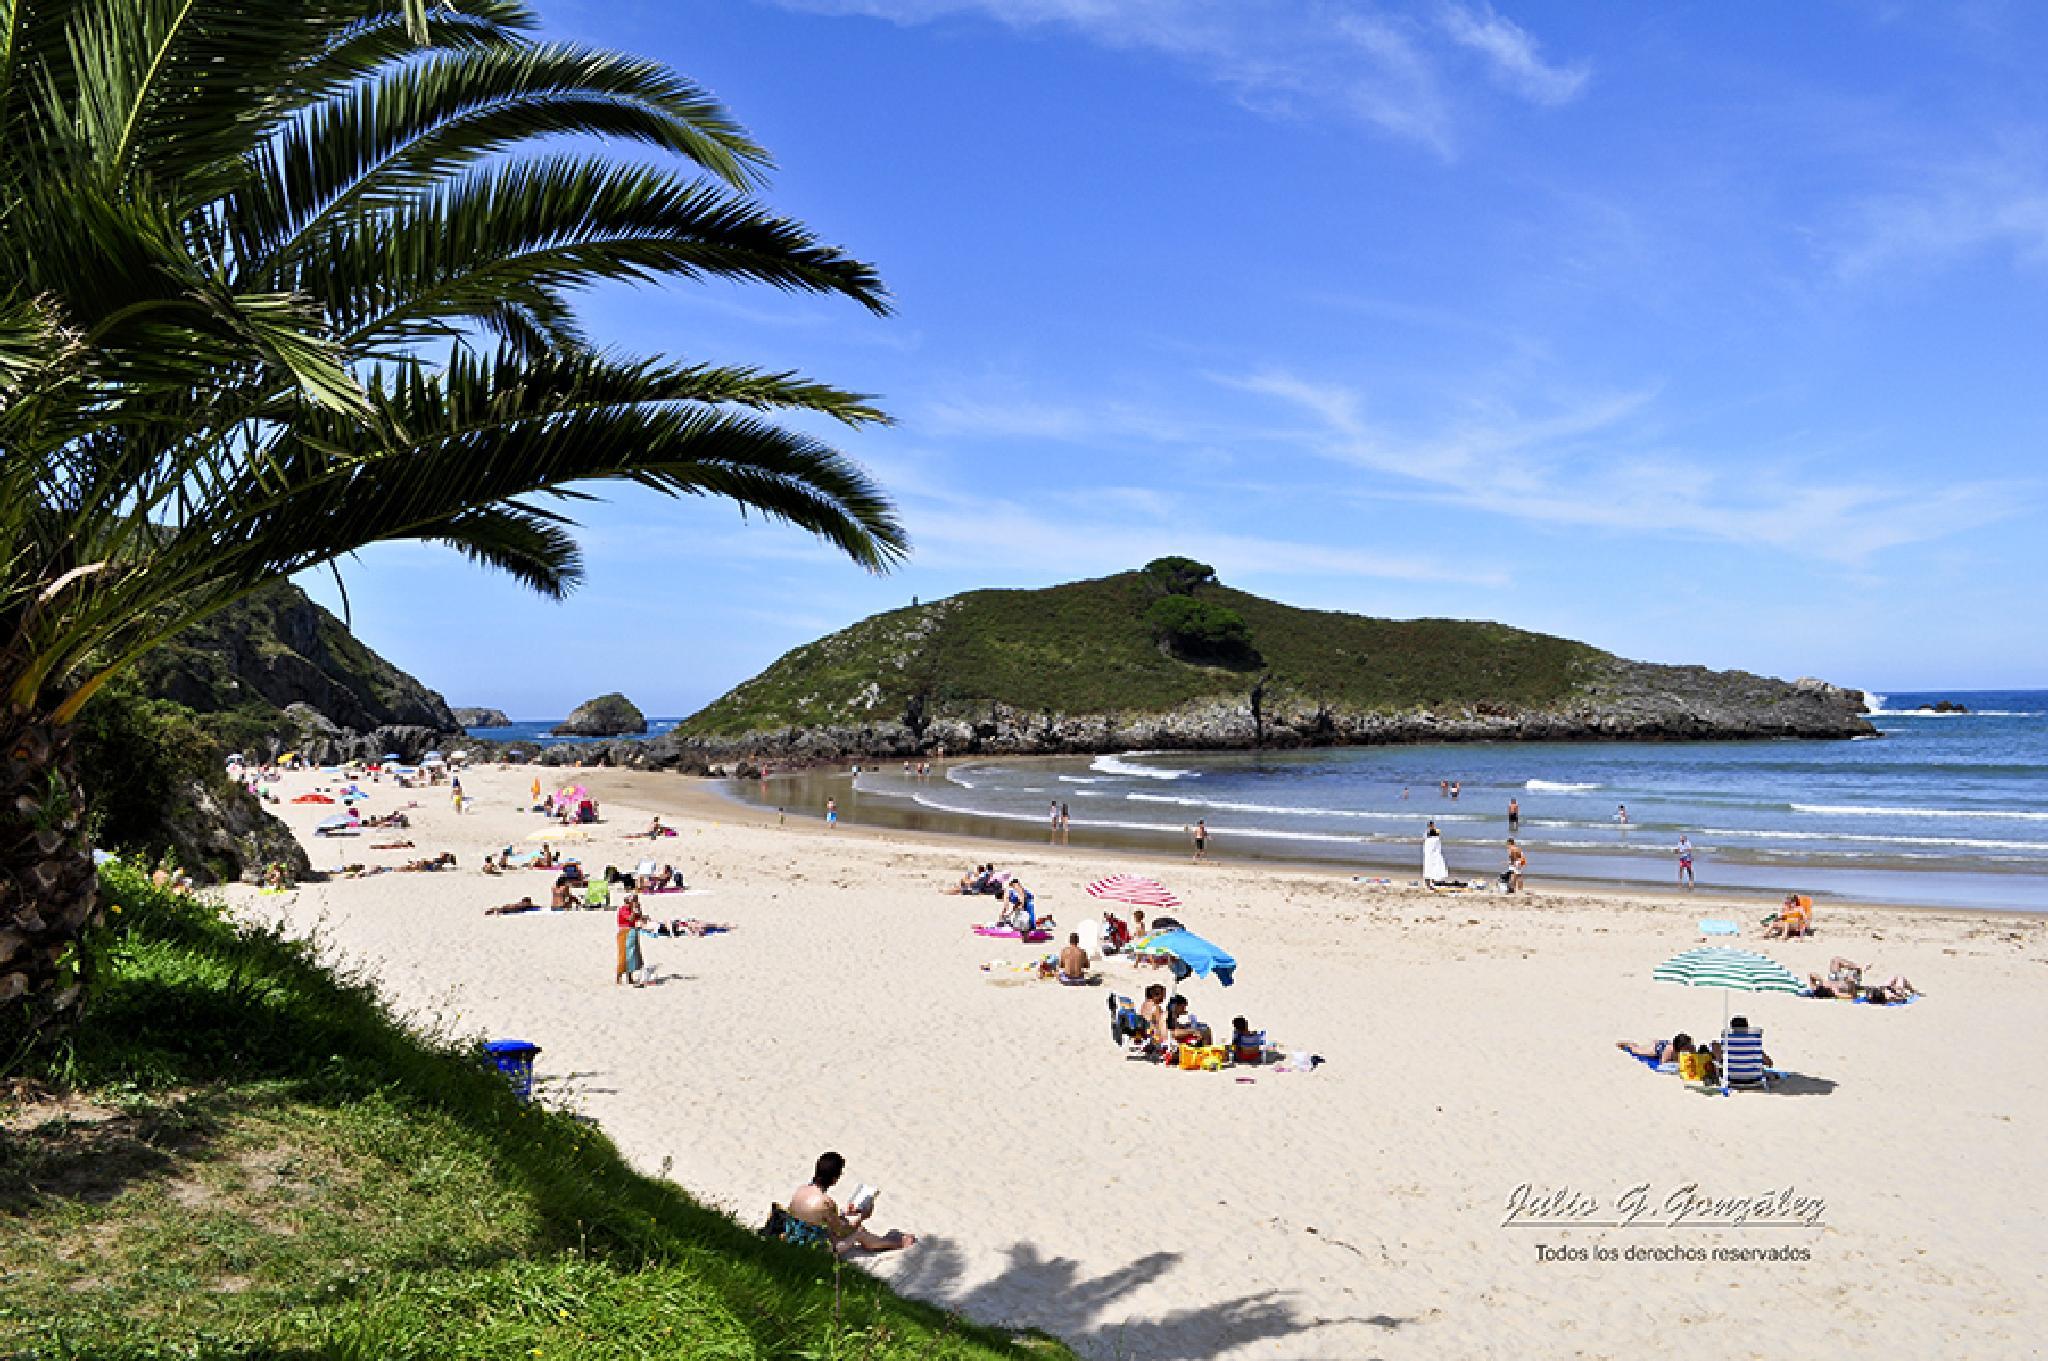 Playa de Barro by Julio G.González